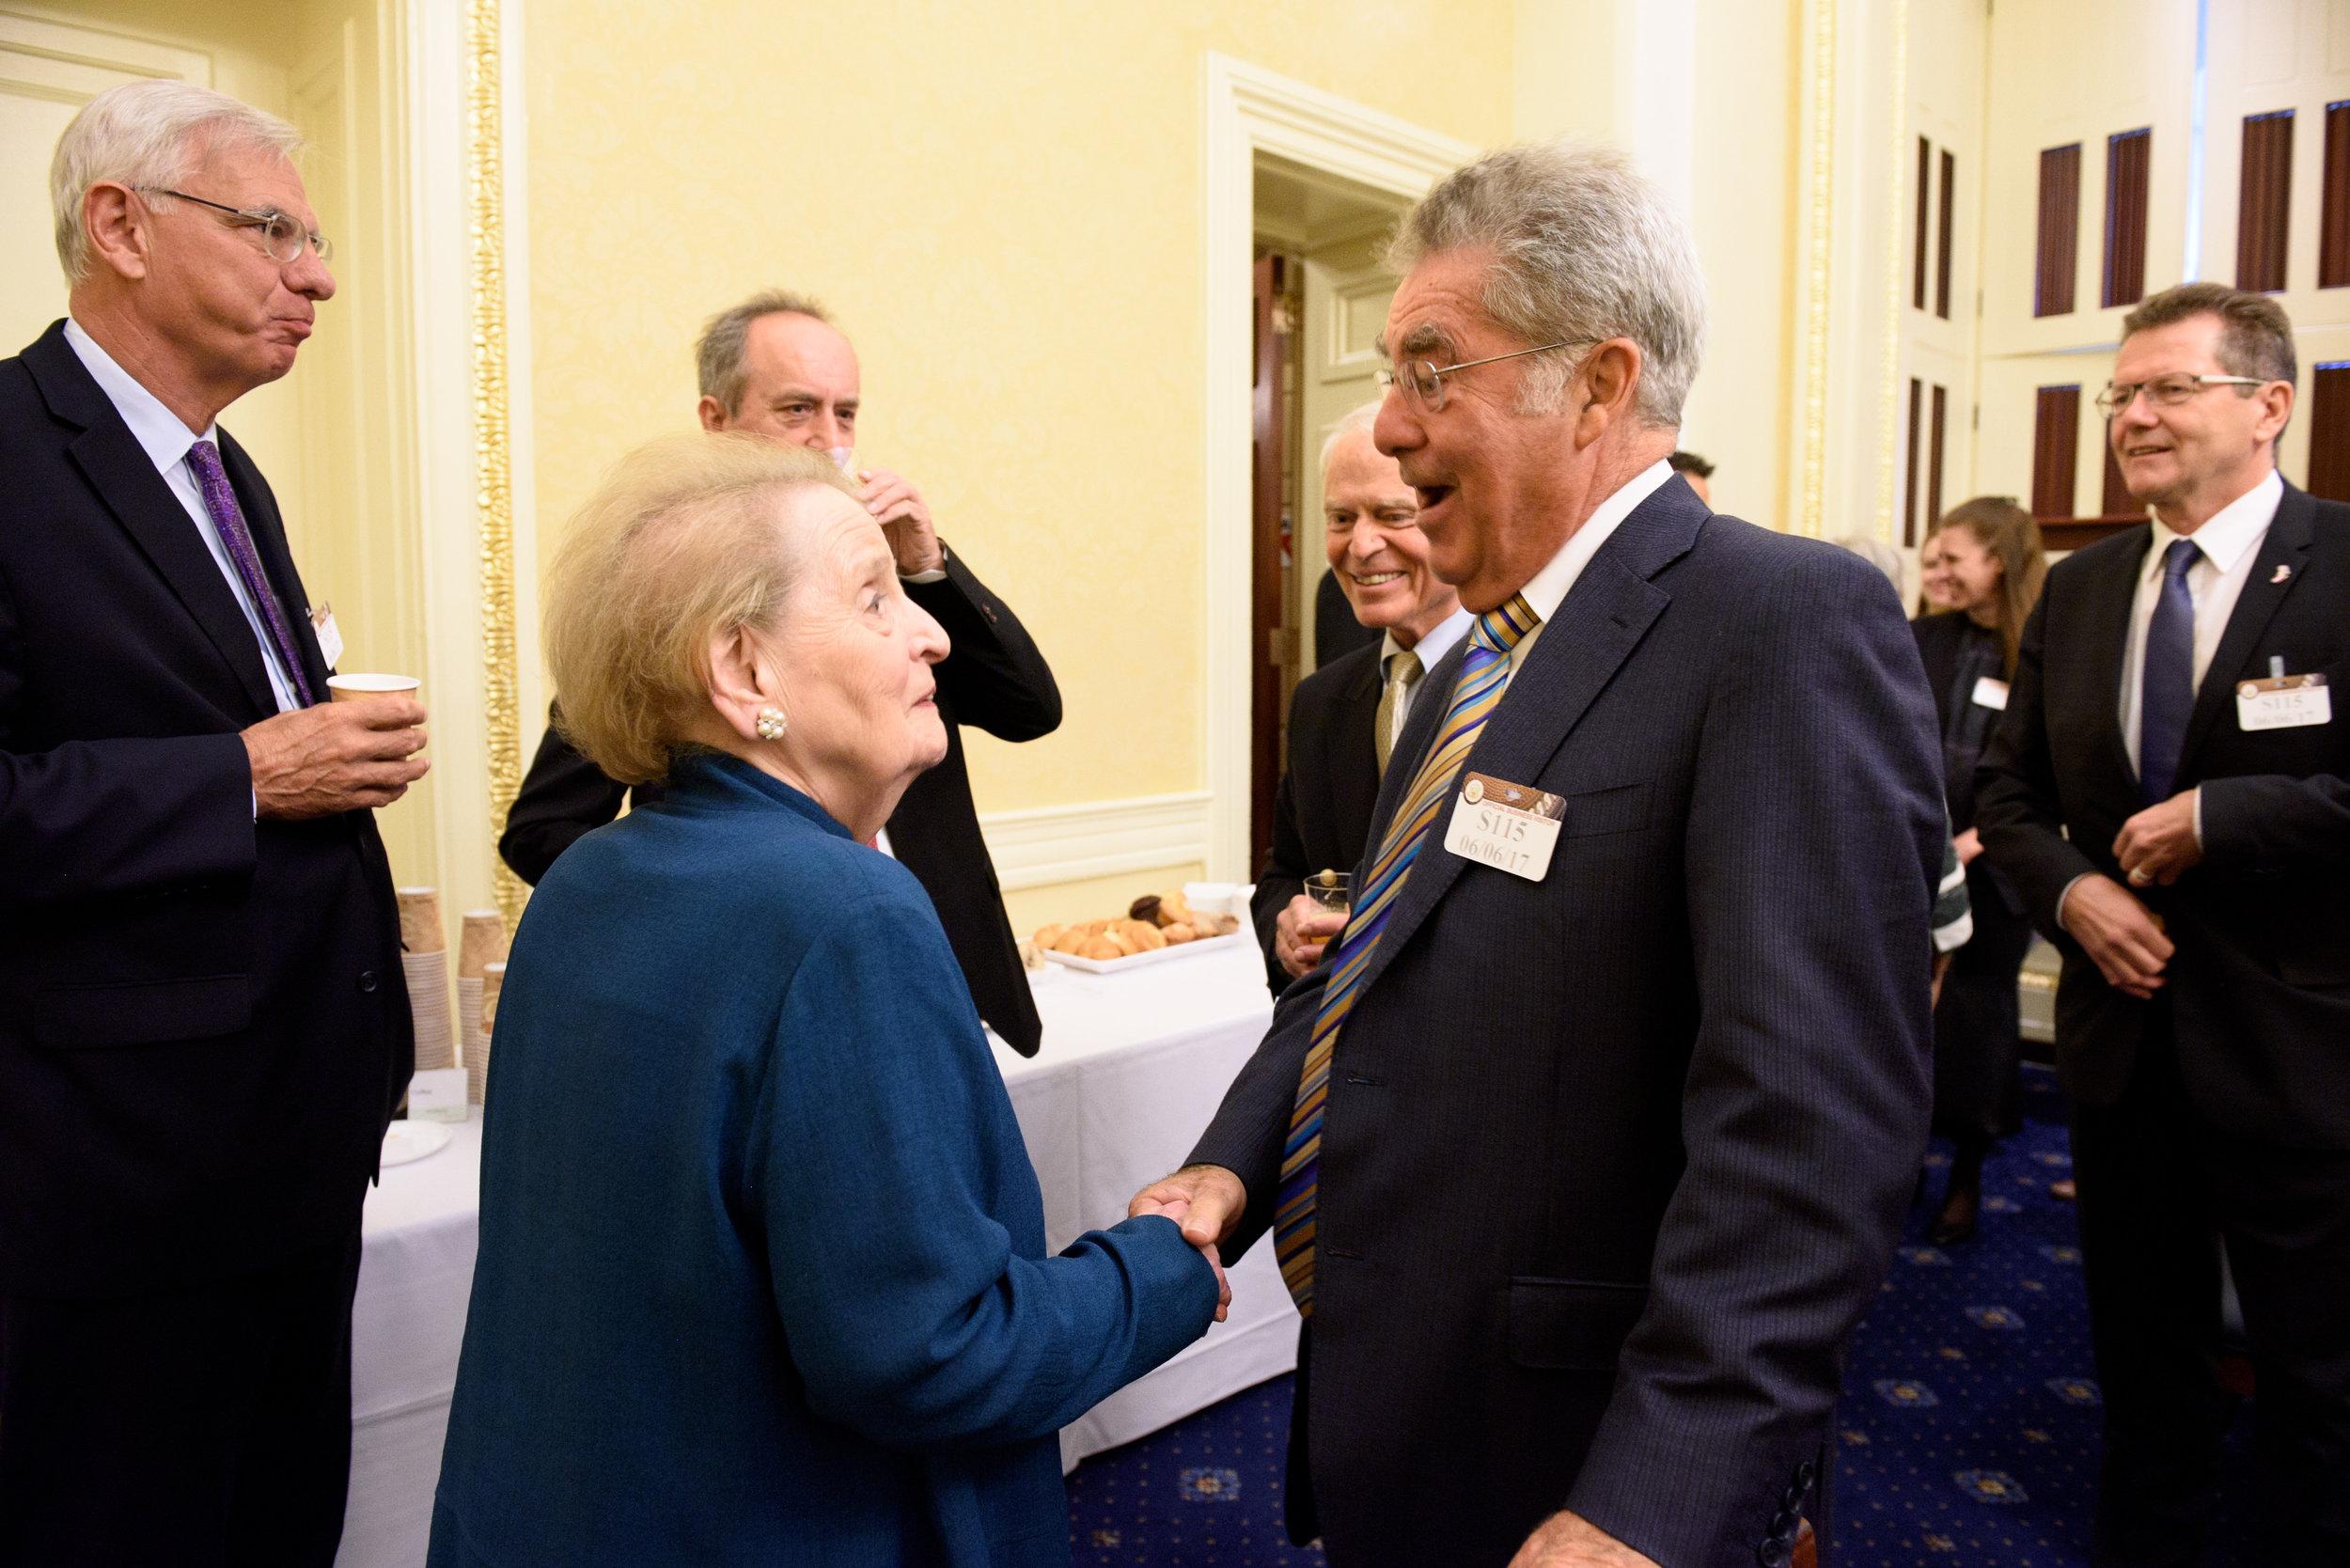 Heinz Fischer, former President of Austria (right), meeting Madame Secretary Madeleine Albright (c)Kaveh Sardari Photography